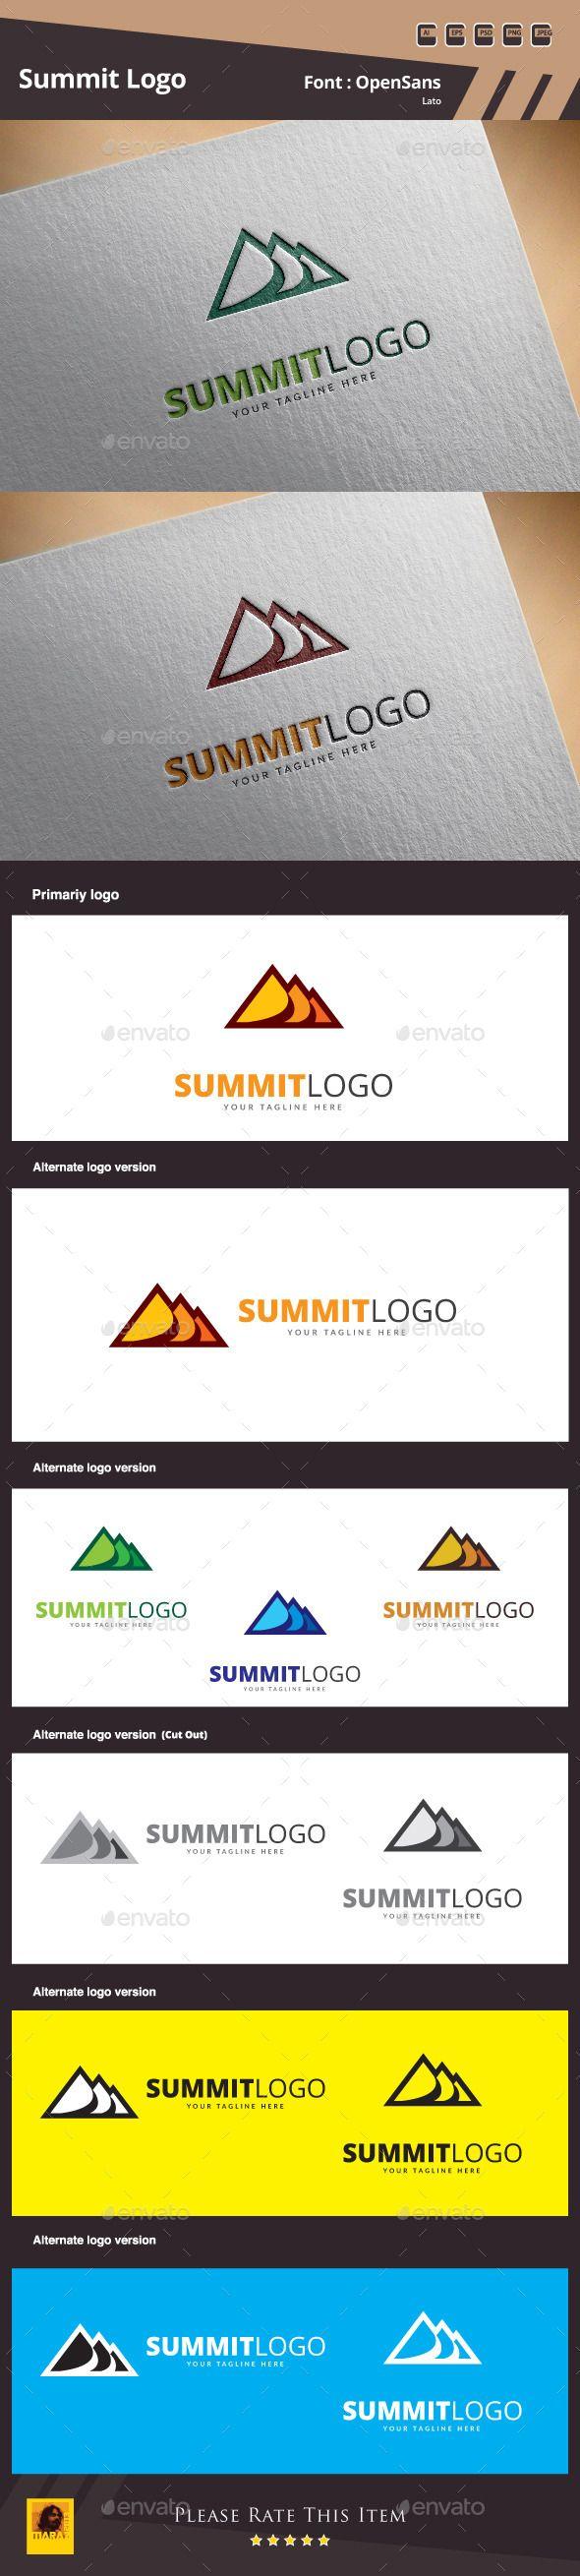 Summit Logo Design Template Vector #logotype Download it here:  http://graphicriver.net/item/summit-logo-template/10398165?s_rank=891?ref=nexion